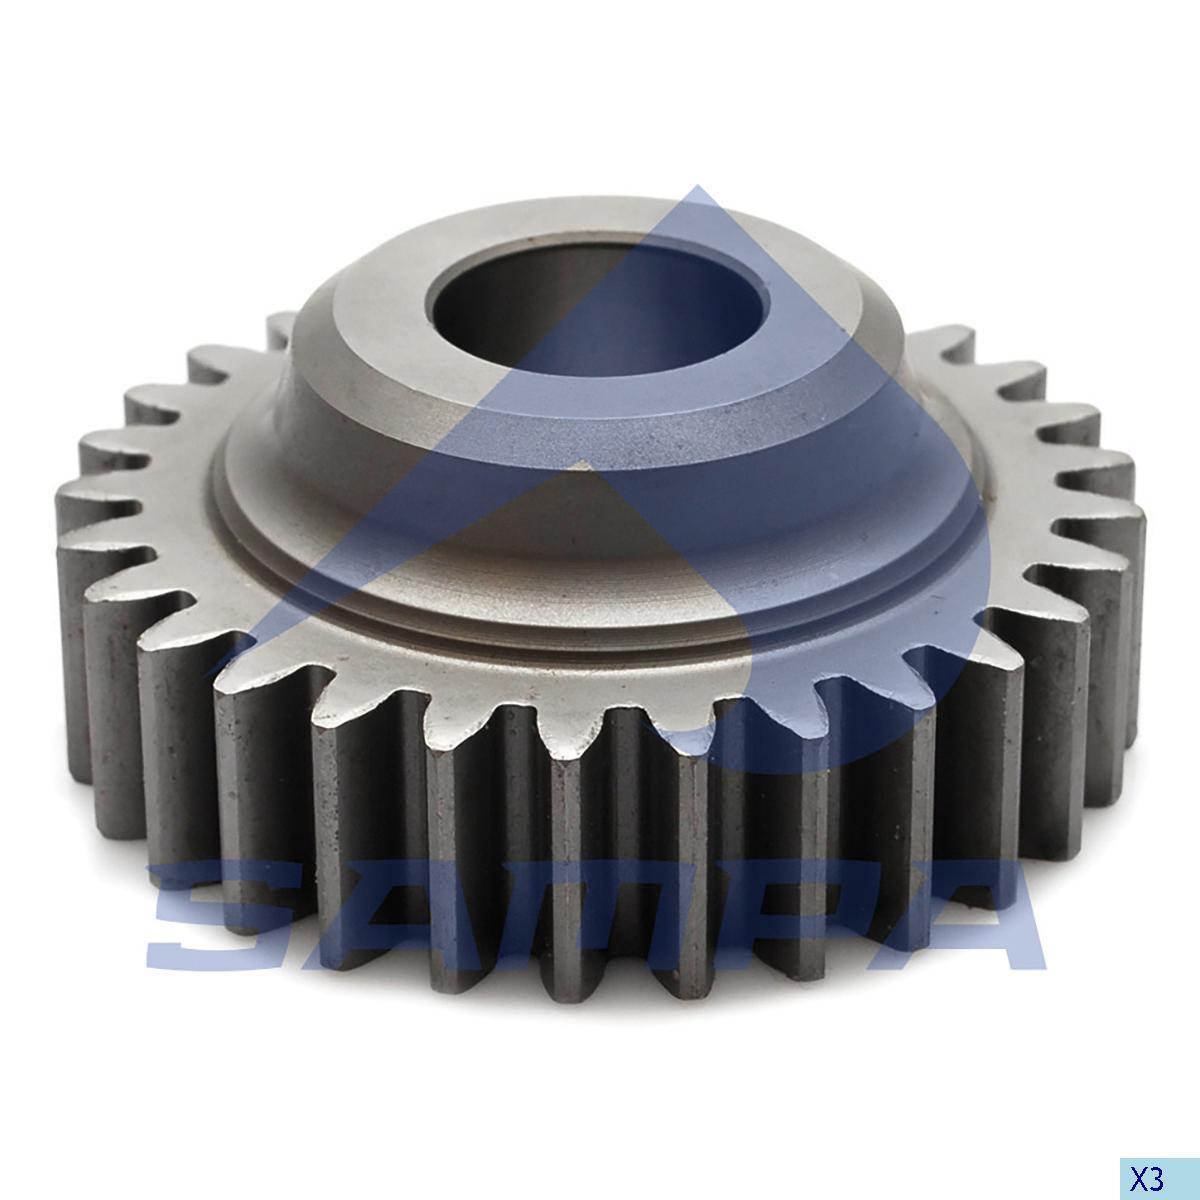 Gear, Compressor, Daf, Compressed Air System